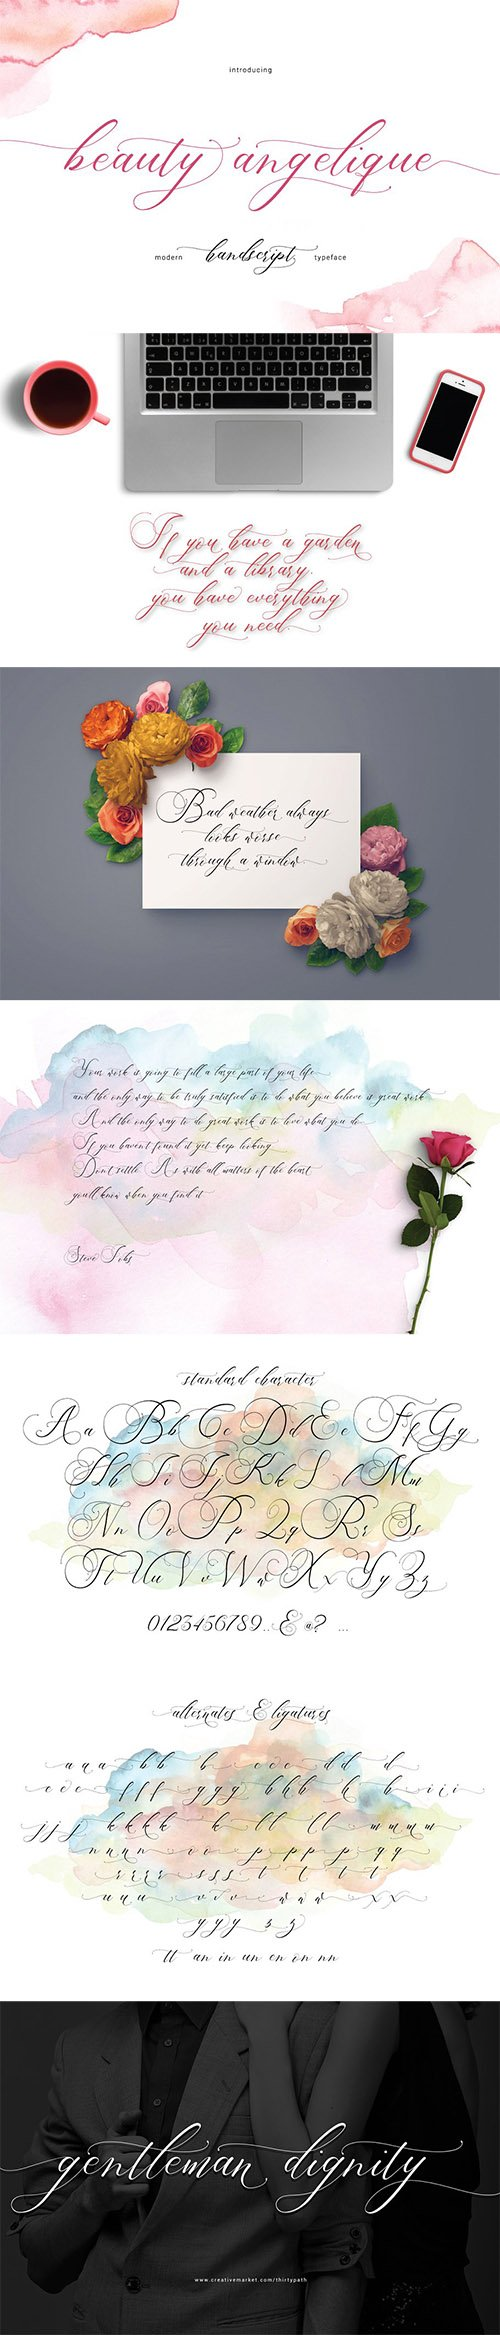 Beauty Angelique Script 948331